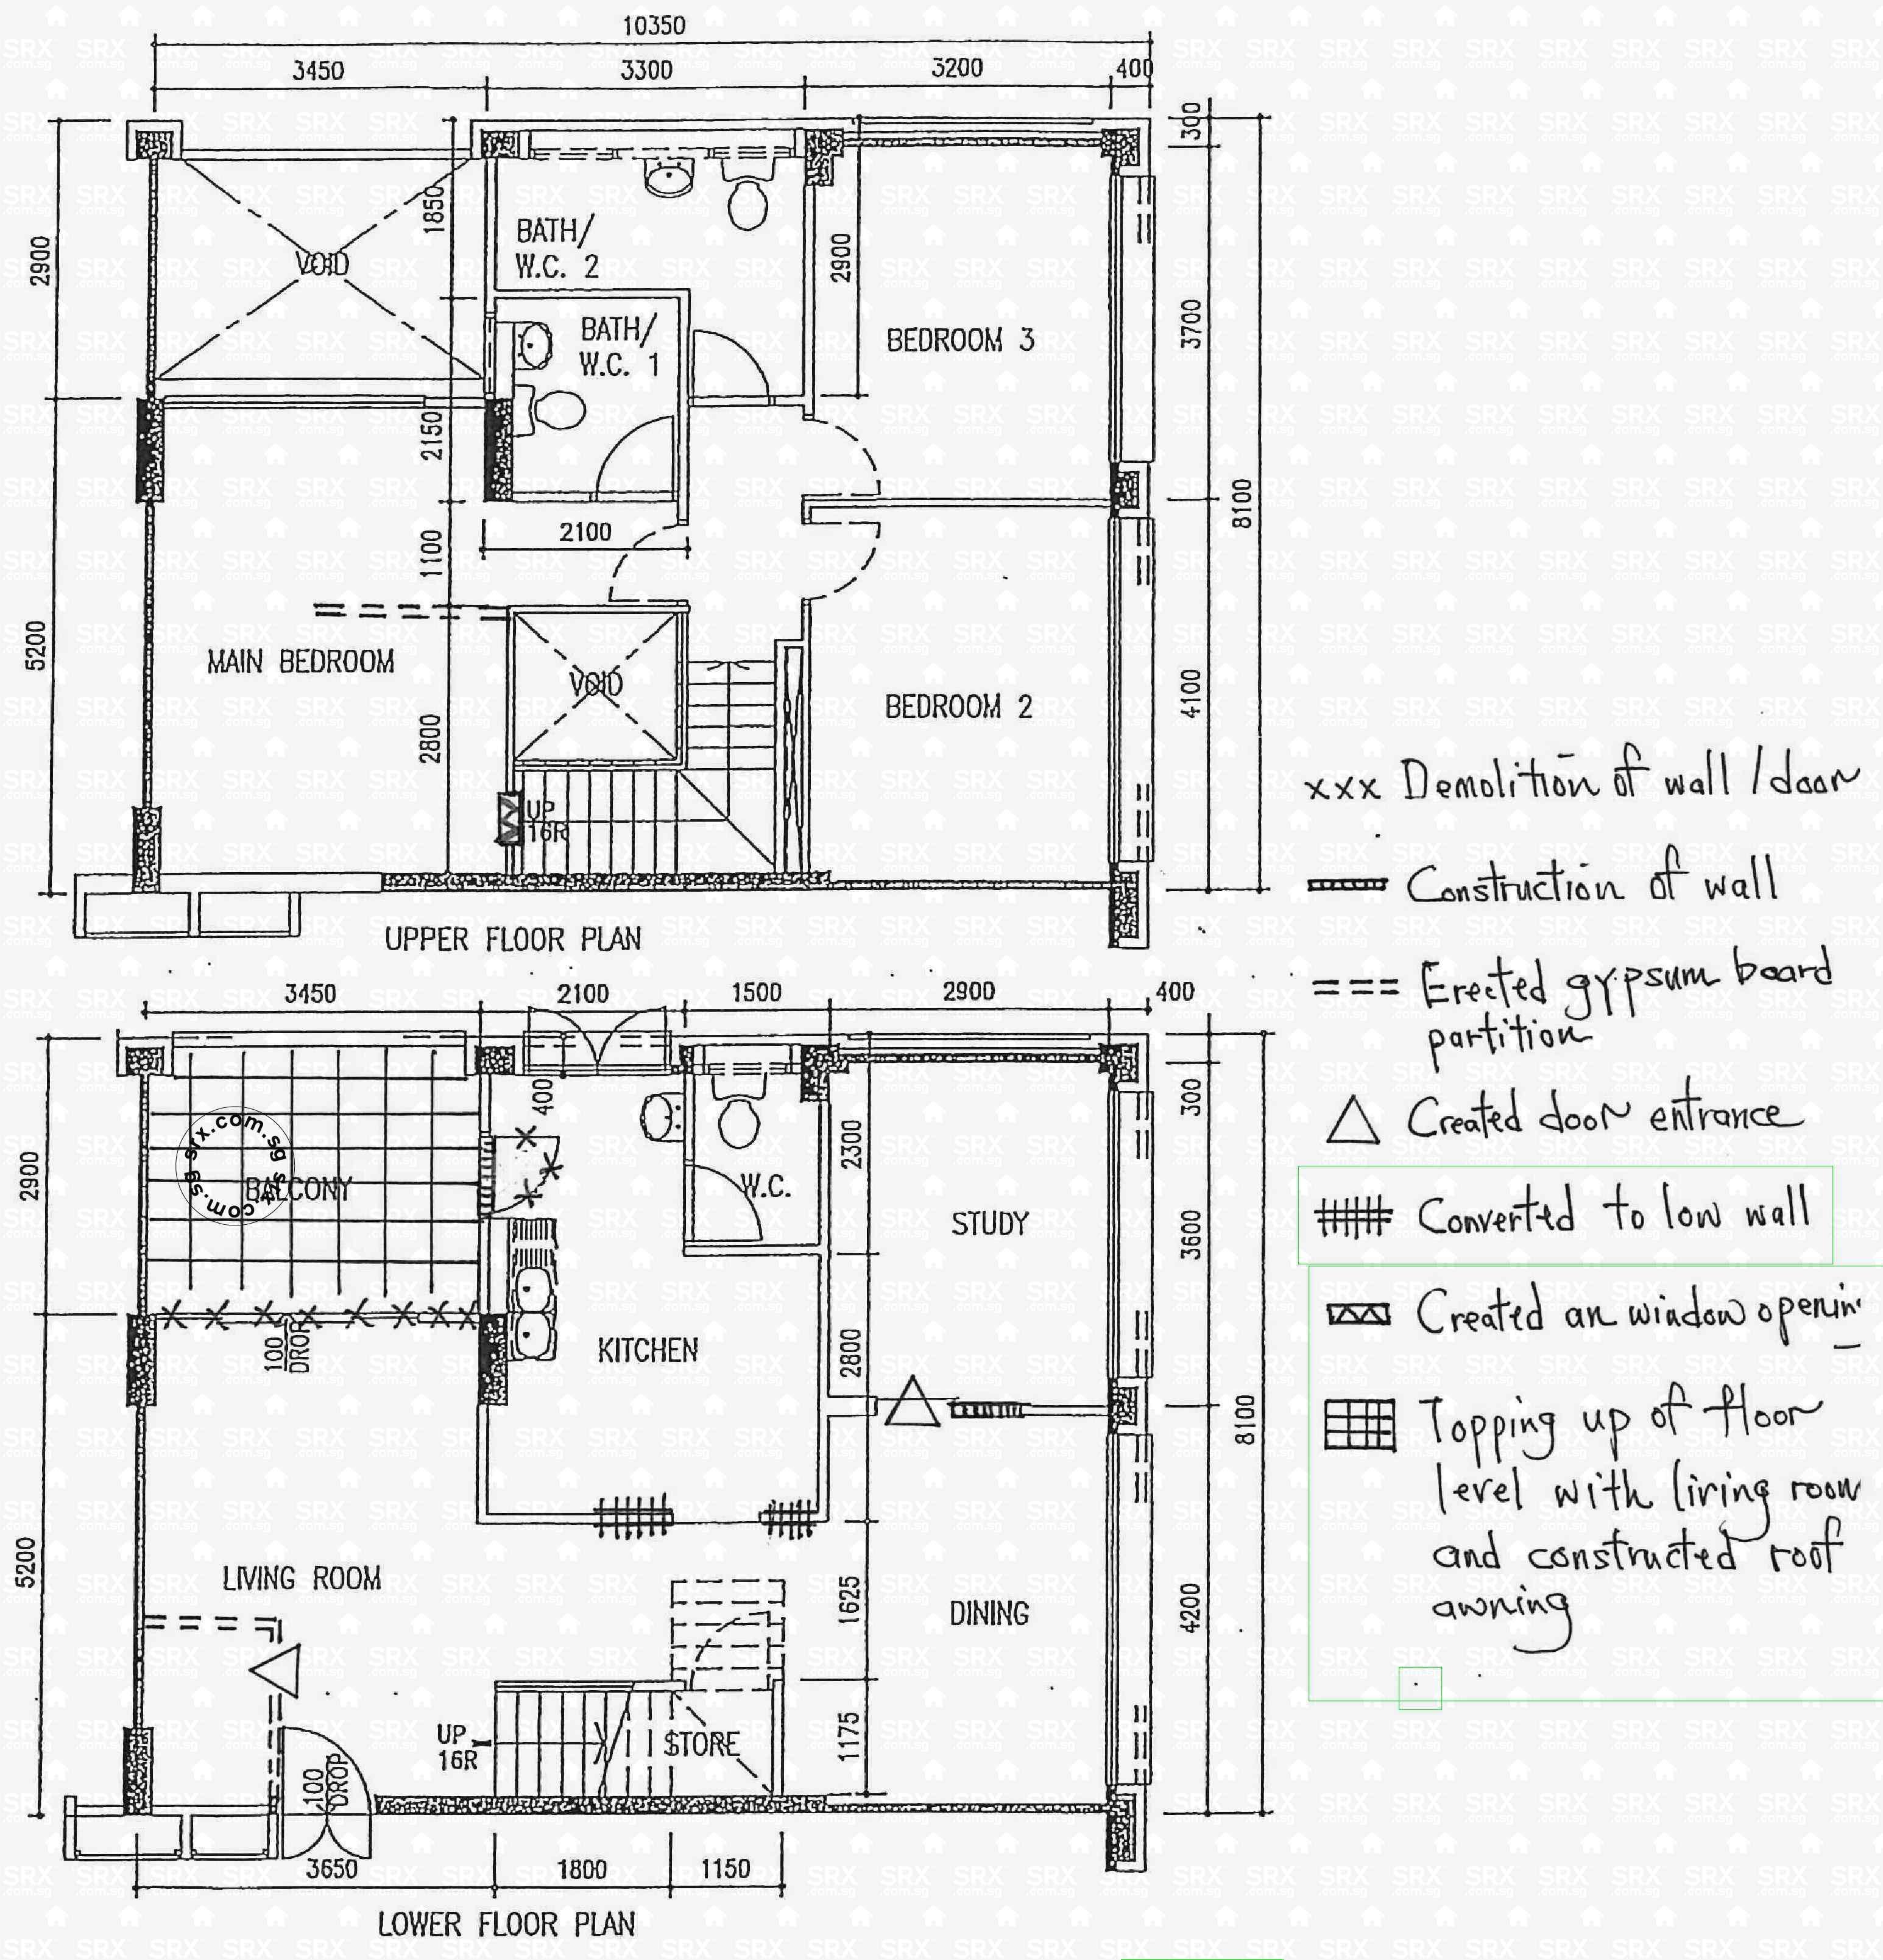 603 elias road s 510603 hdb details srx property for 509 plan